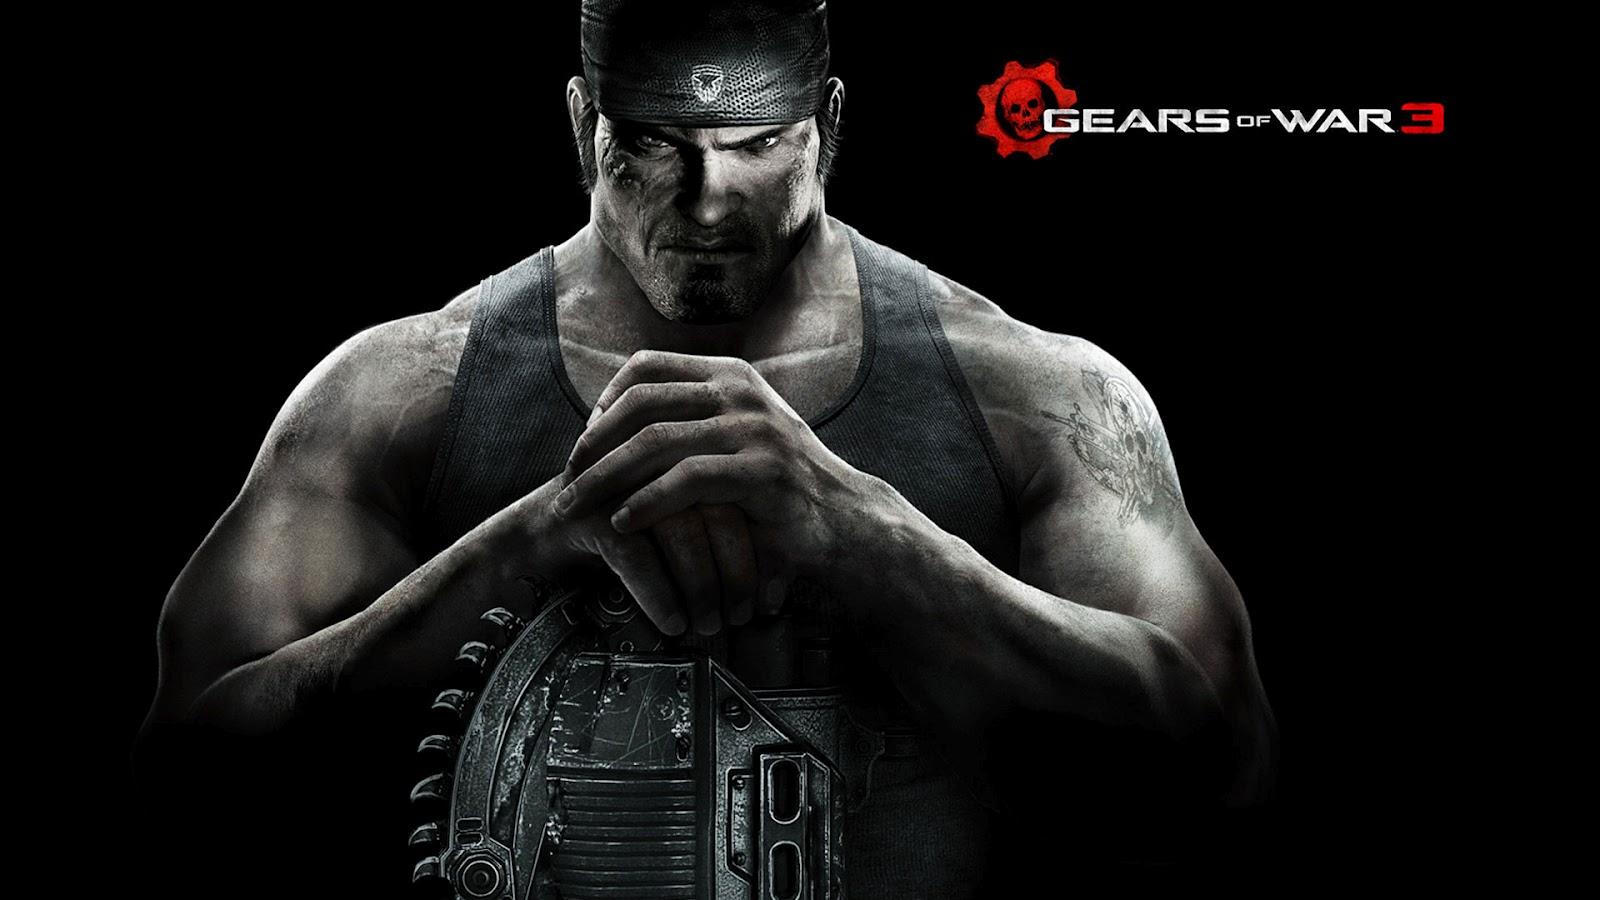 Wallpapers HD: Juego Gear Of War 1, 2, 3 - Wallpapers HD ...